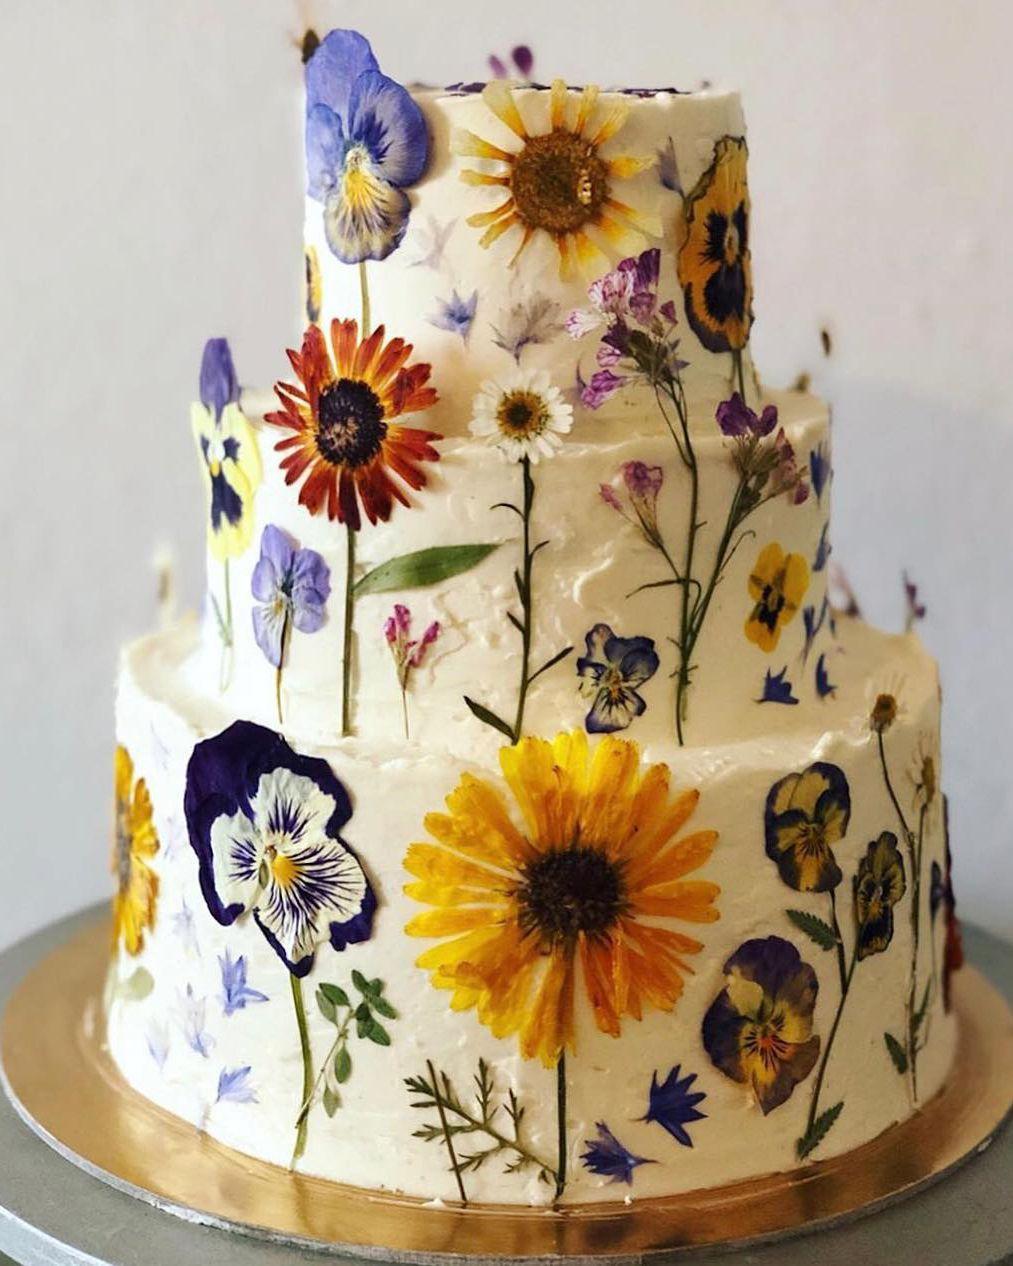 "Happy Gardens 😀 on Instagram ""Cake of Love + Joy + Colors"